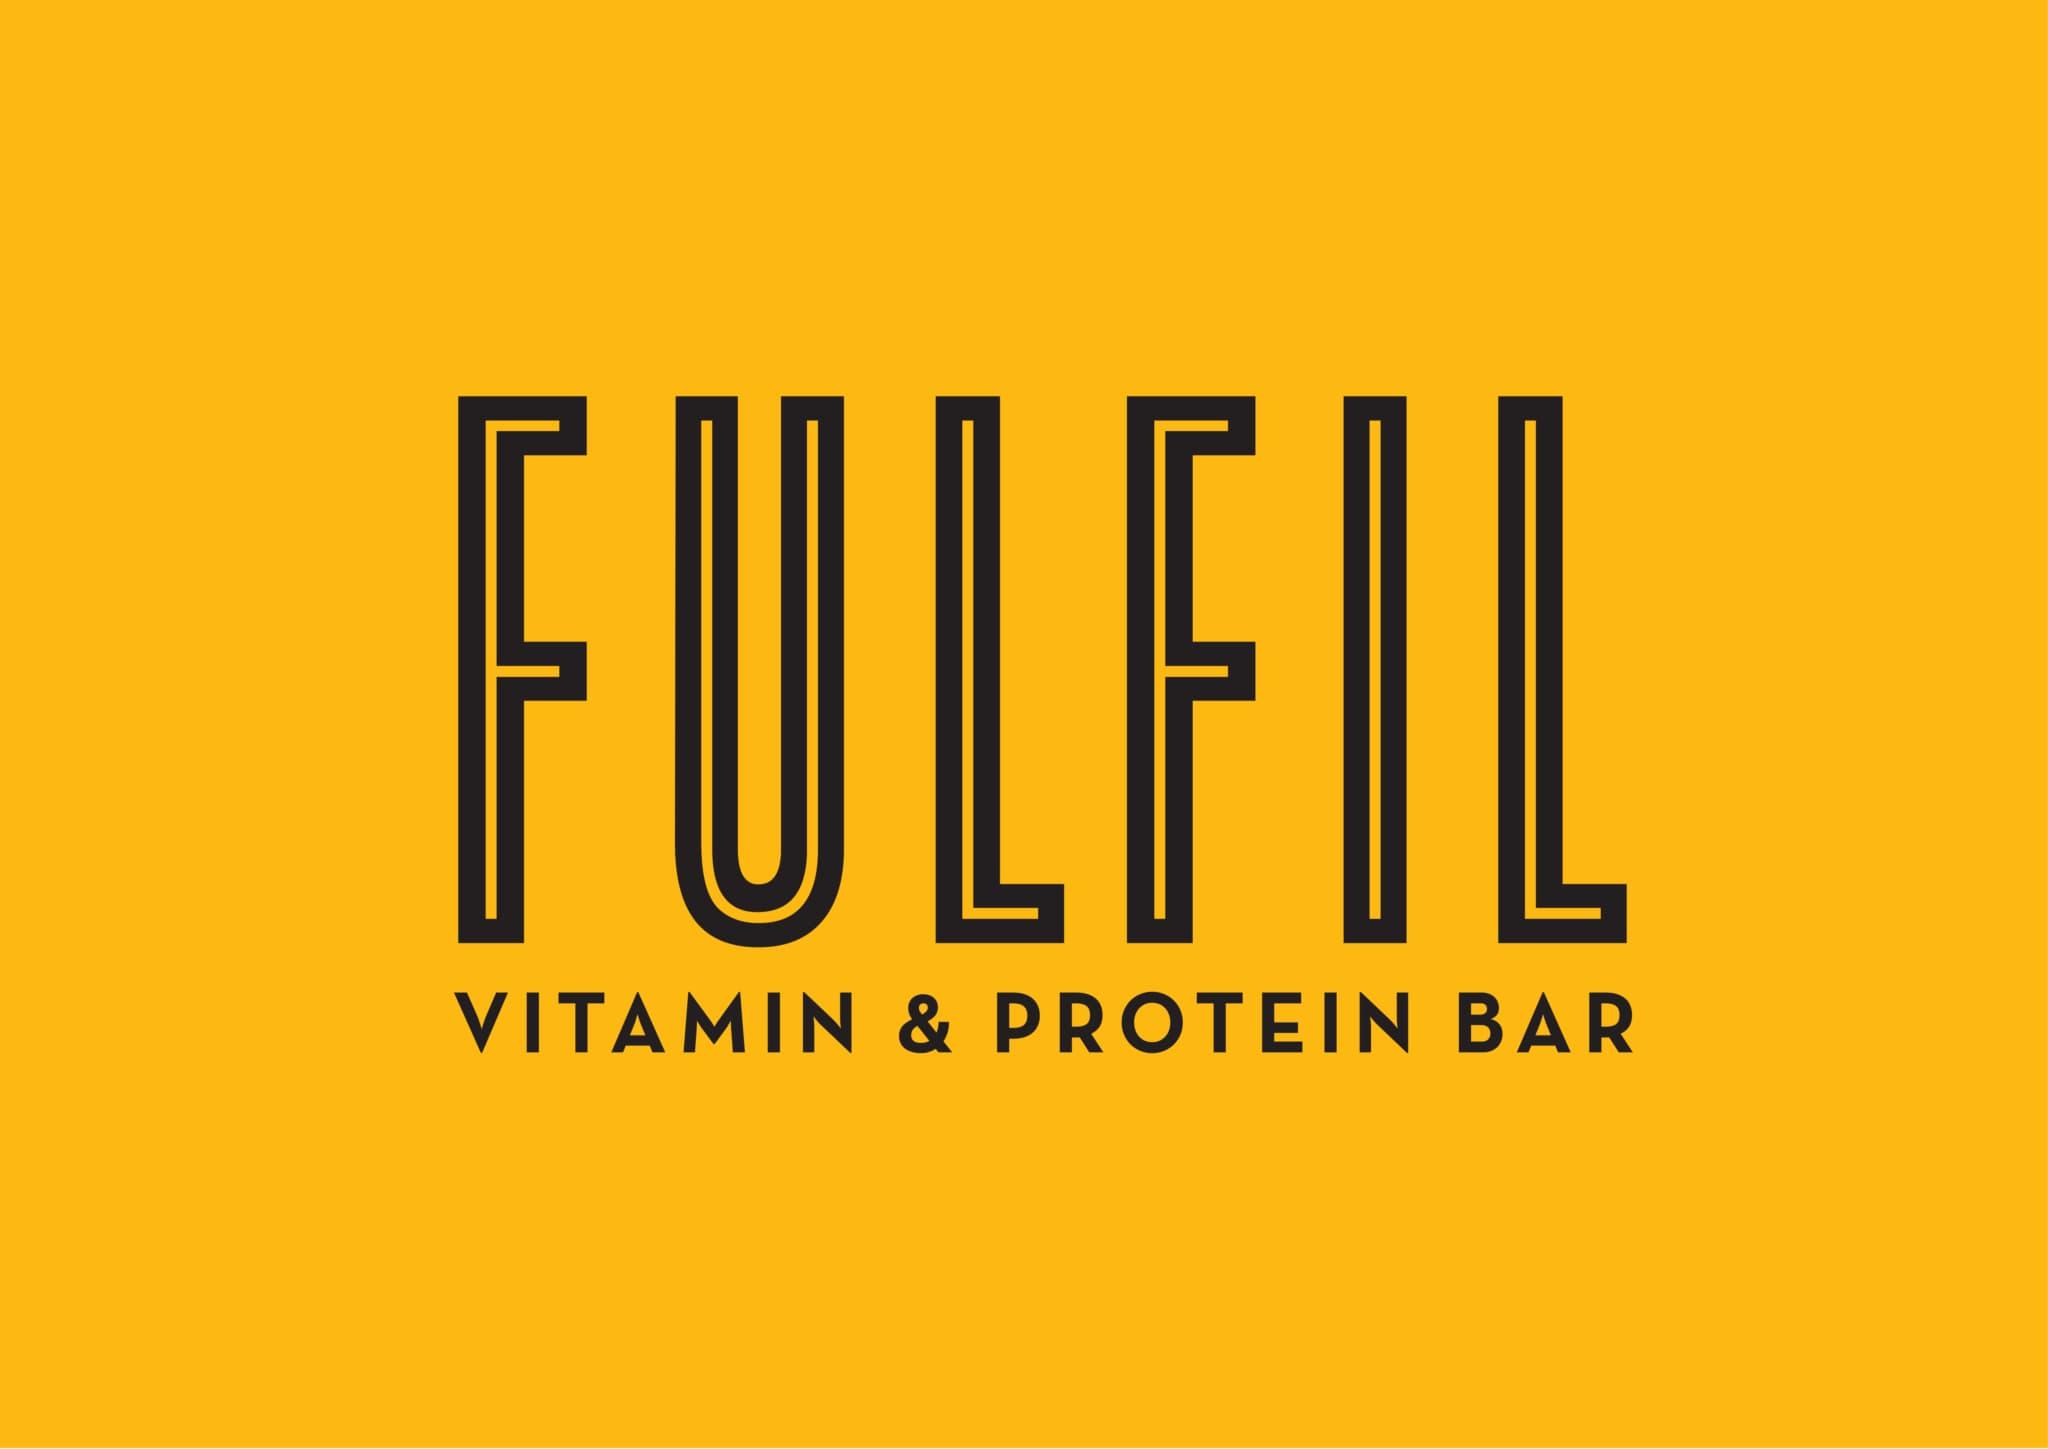 Fulfil Nutrition